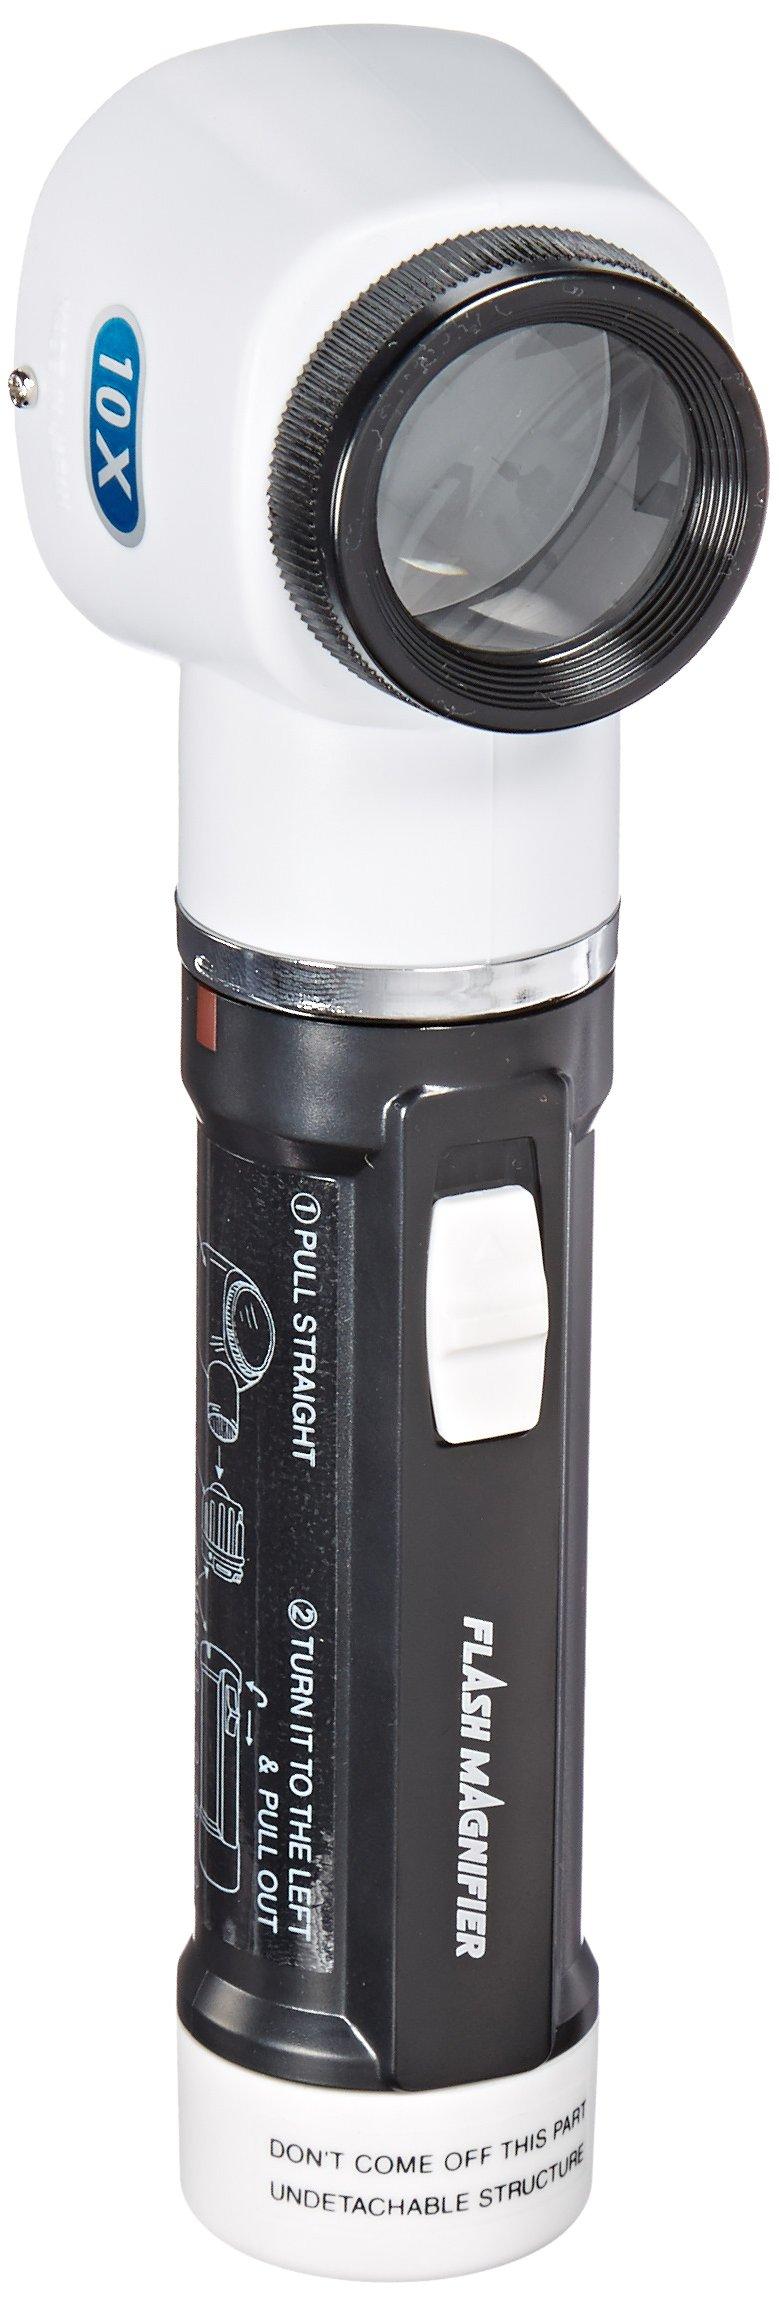 Donegan V980-10 Flashlight Magnifier with Measurement Scale Lens, 10x Magnification, 30mm Lens Diameter